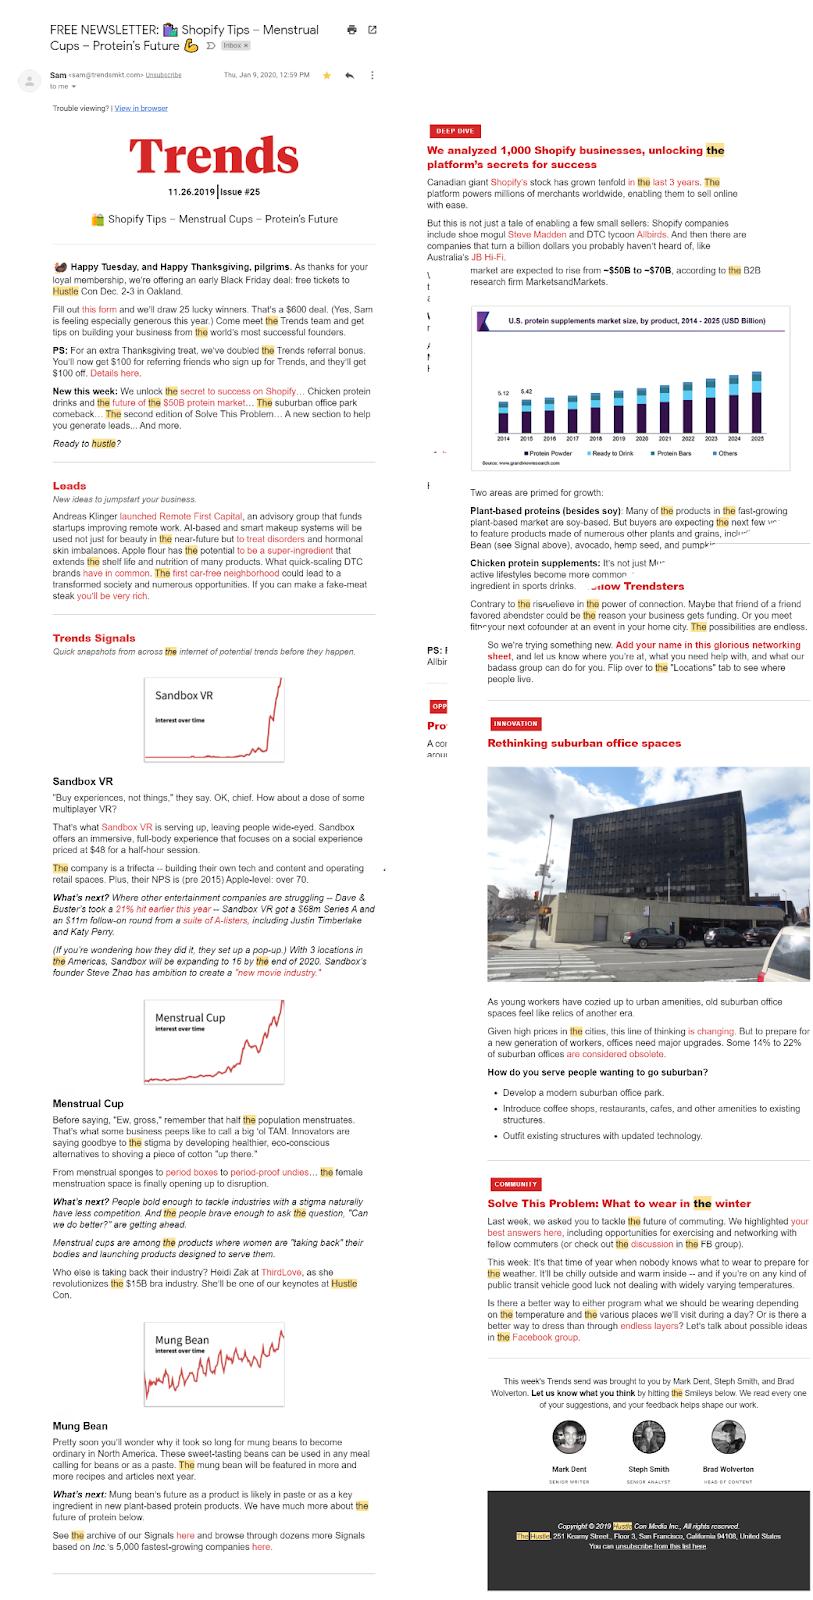 Screenshot of the Trends premium newsletter